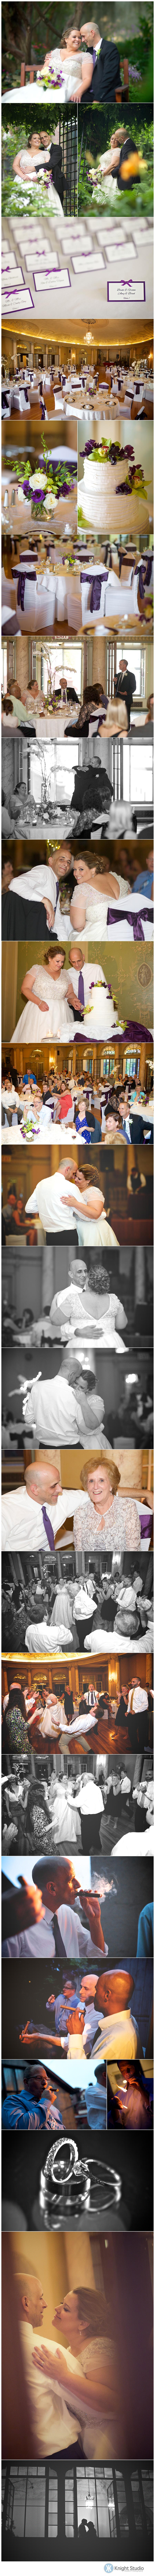 Blog Collage-1409343665351